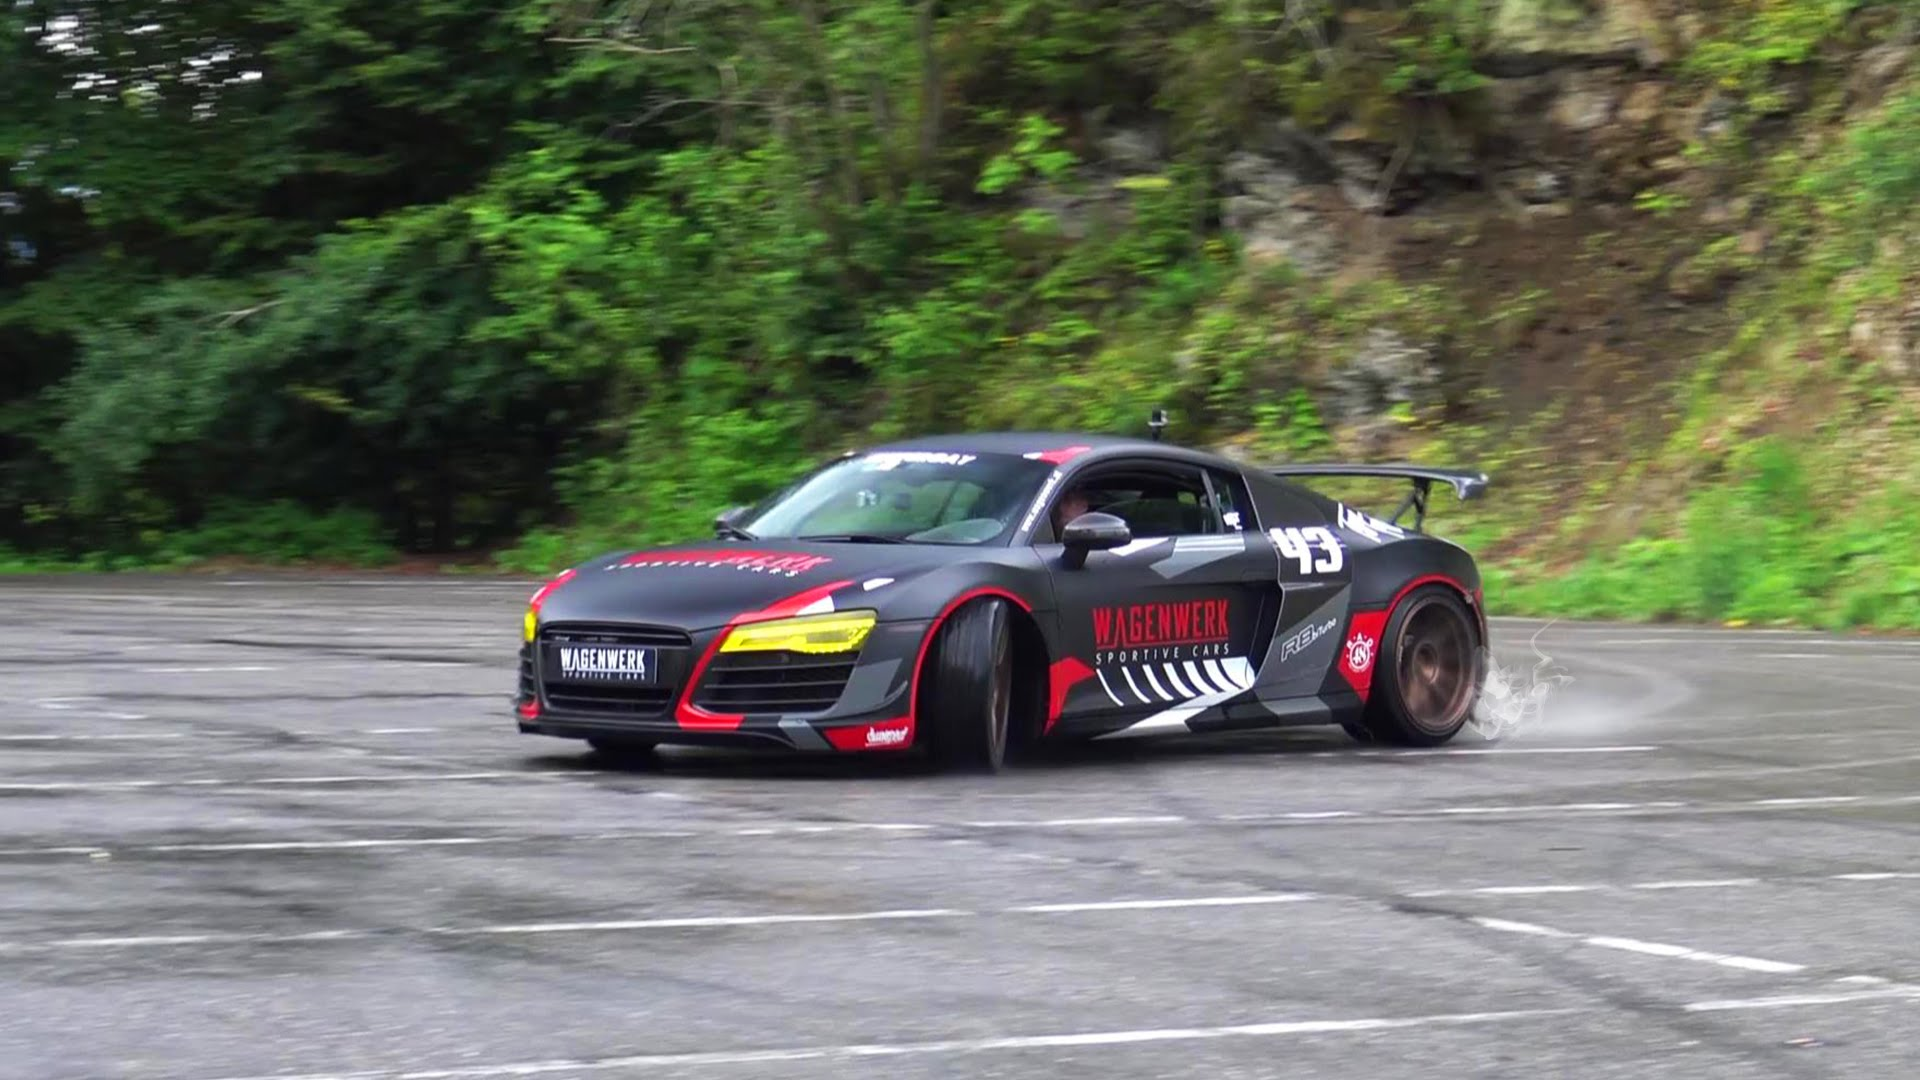 Mental Audi R8 Bi-Turbo Performs Donuts and Drifting - autoevolution